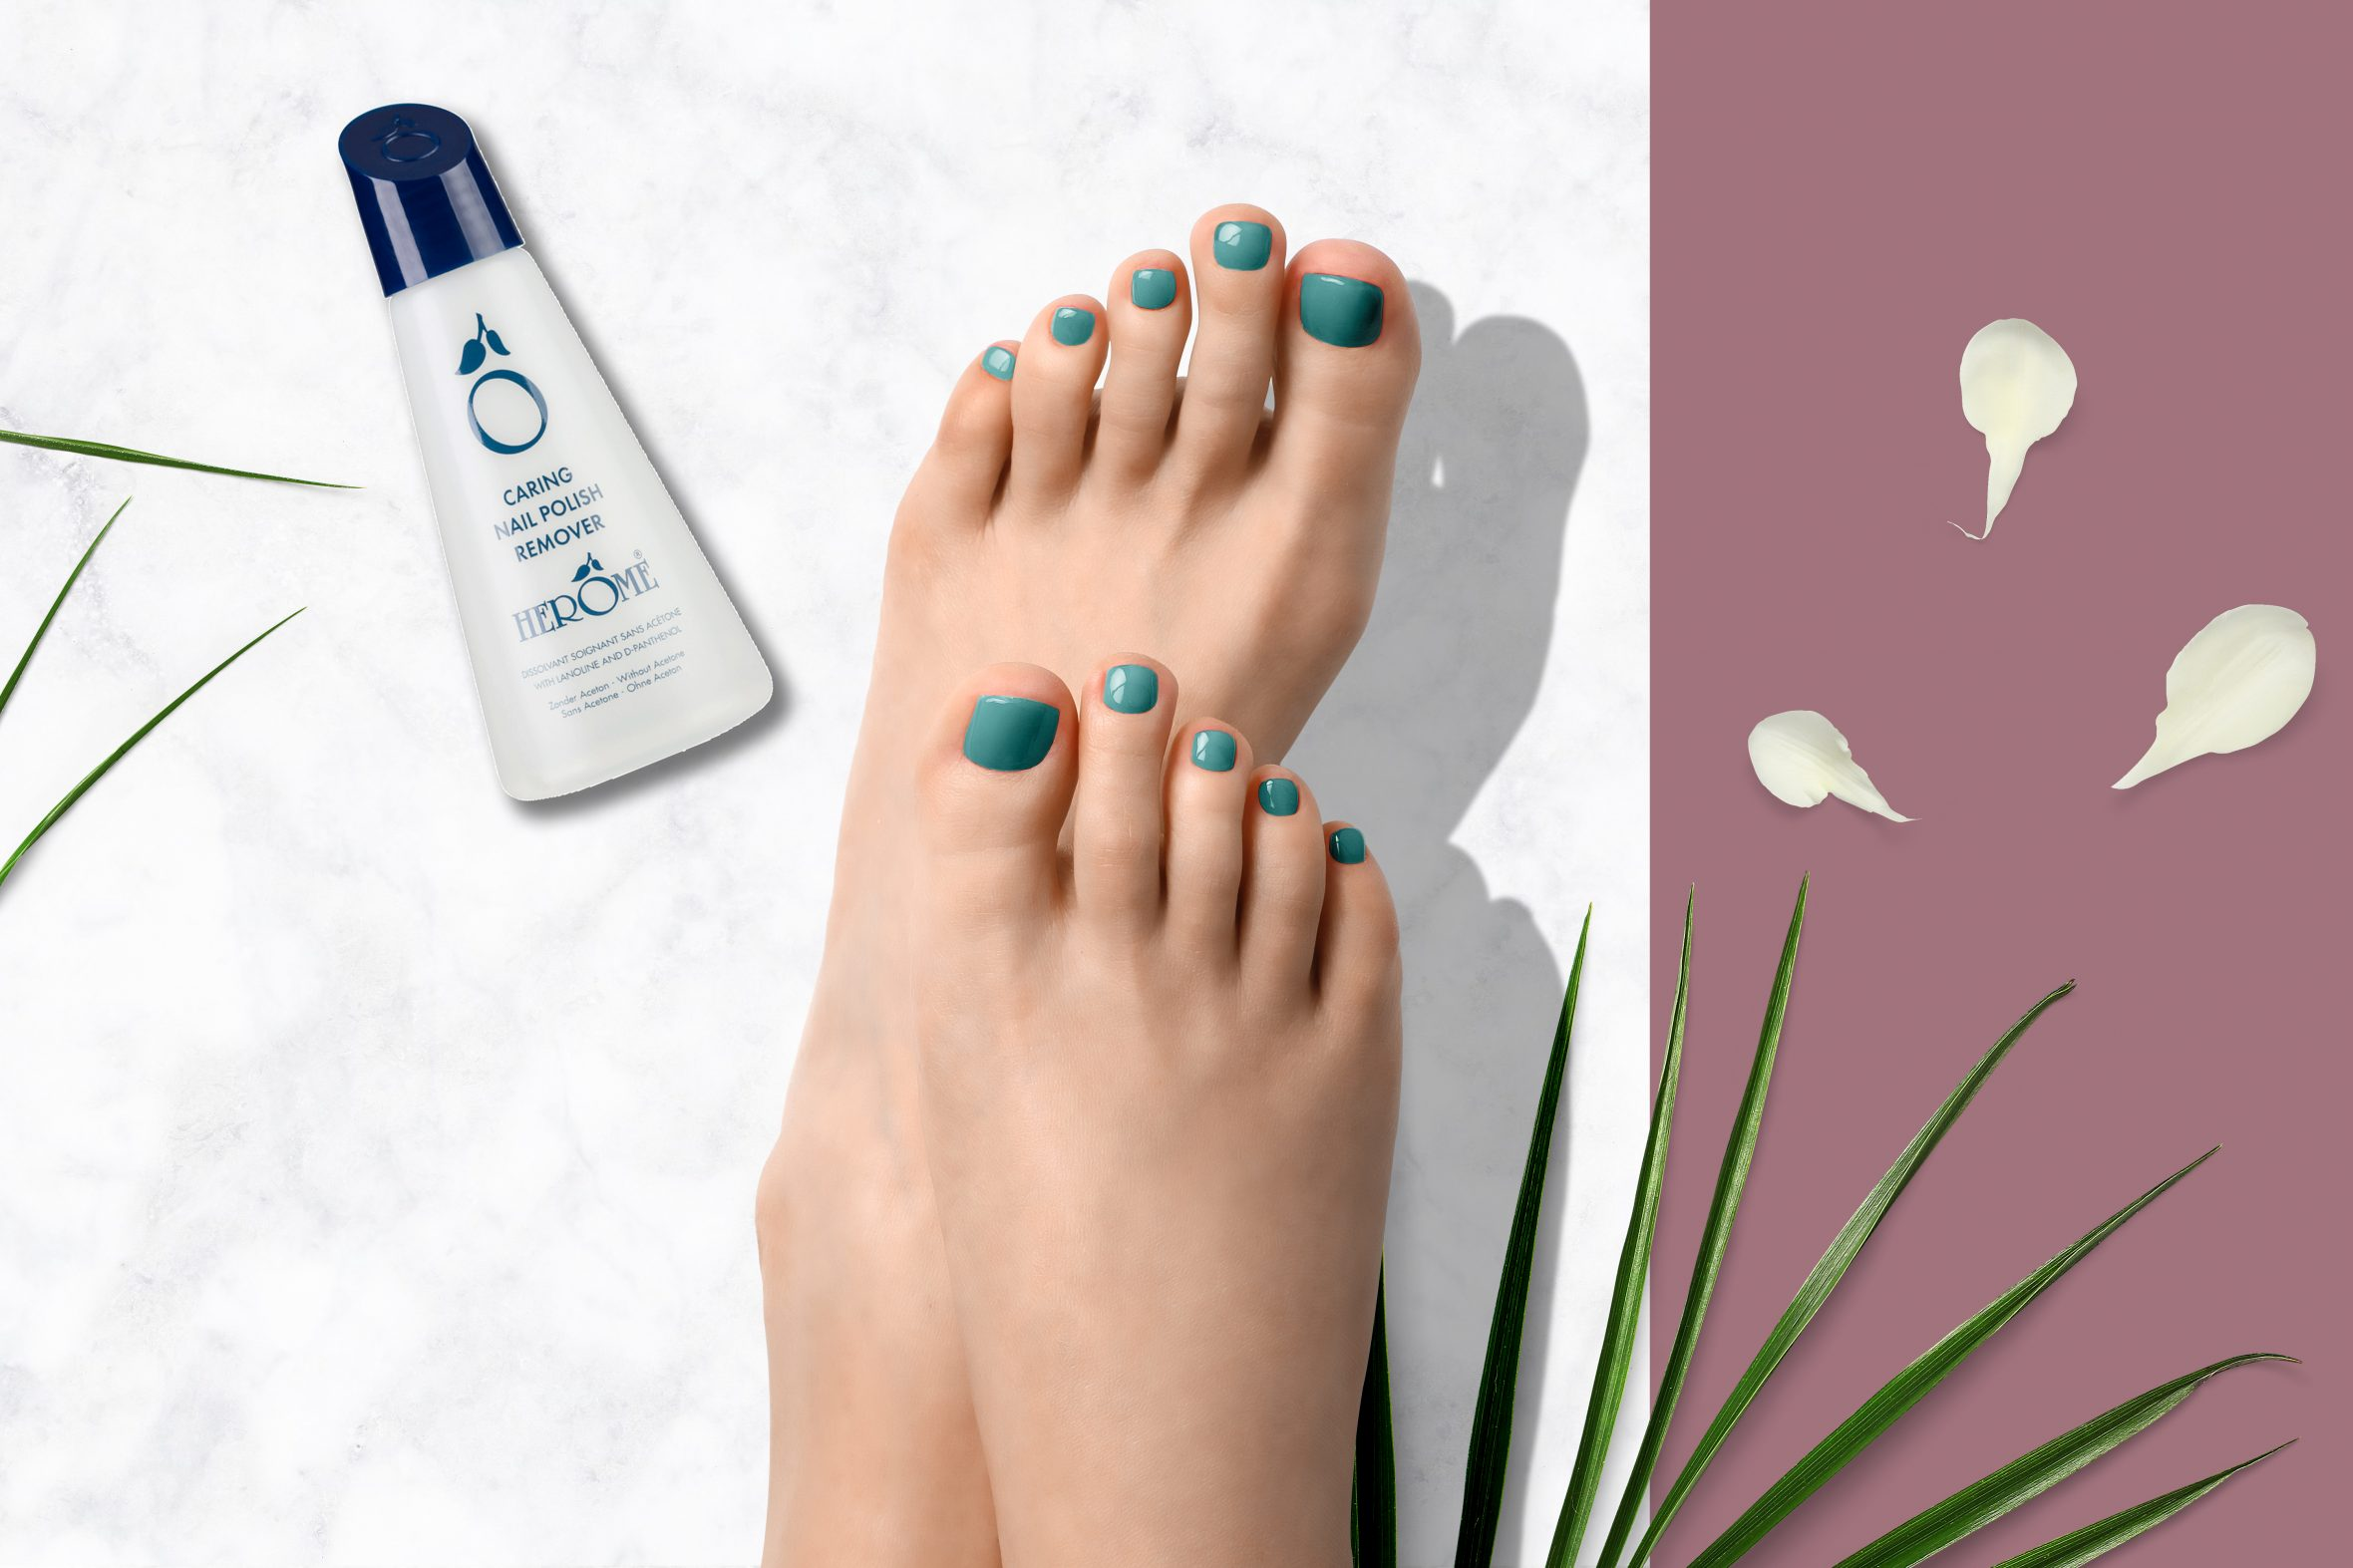 blauwe nagellak kleurnummer 174 van de Herôme nagellak kleuren